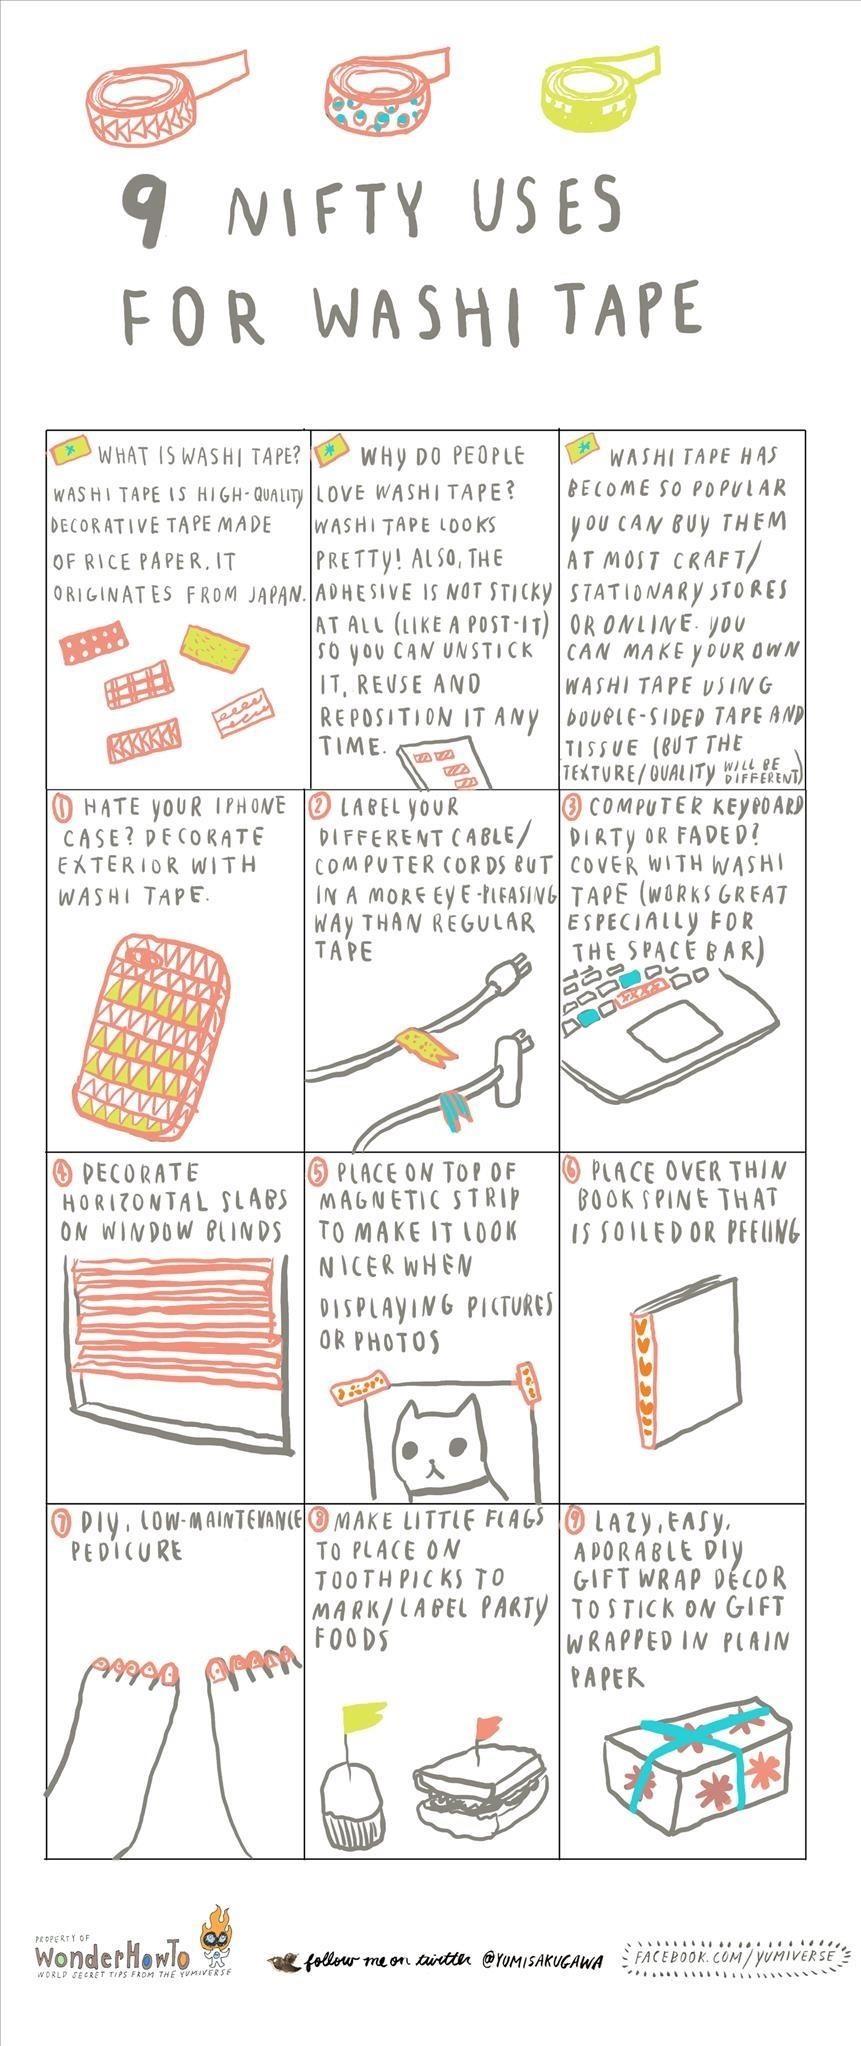 9 Nifty Ways to Use Washi Tape